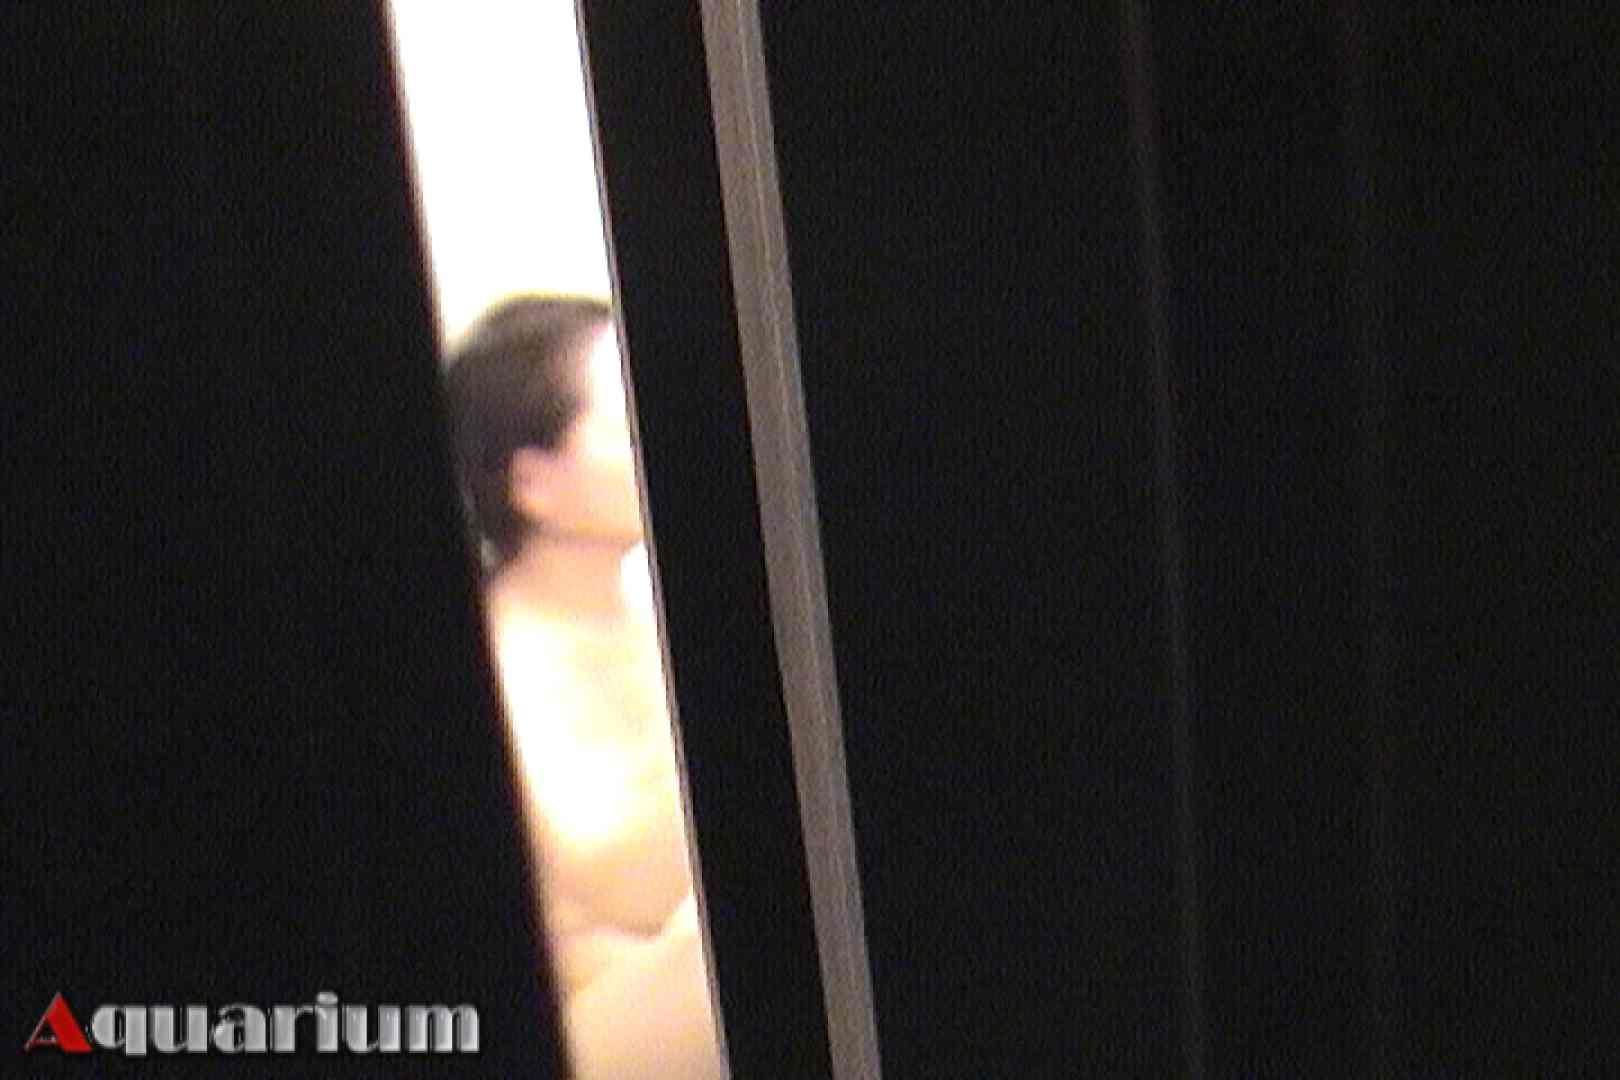 旅館脱衣所お着替え盗撮 Vol.04 盗撮映像  22Pix 2